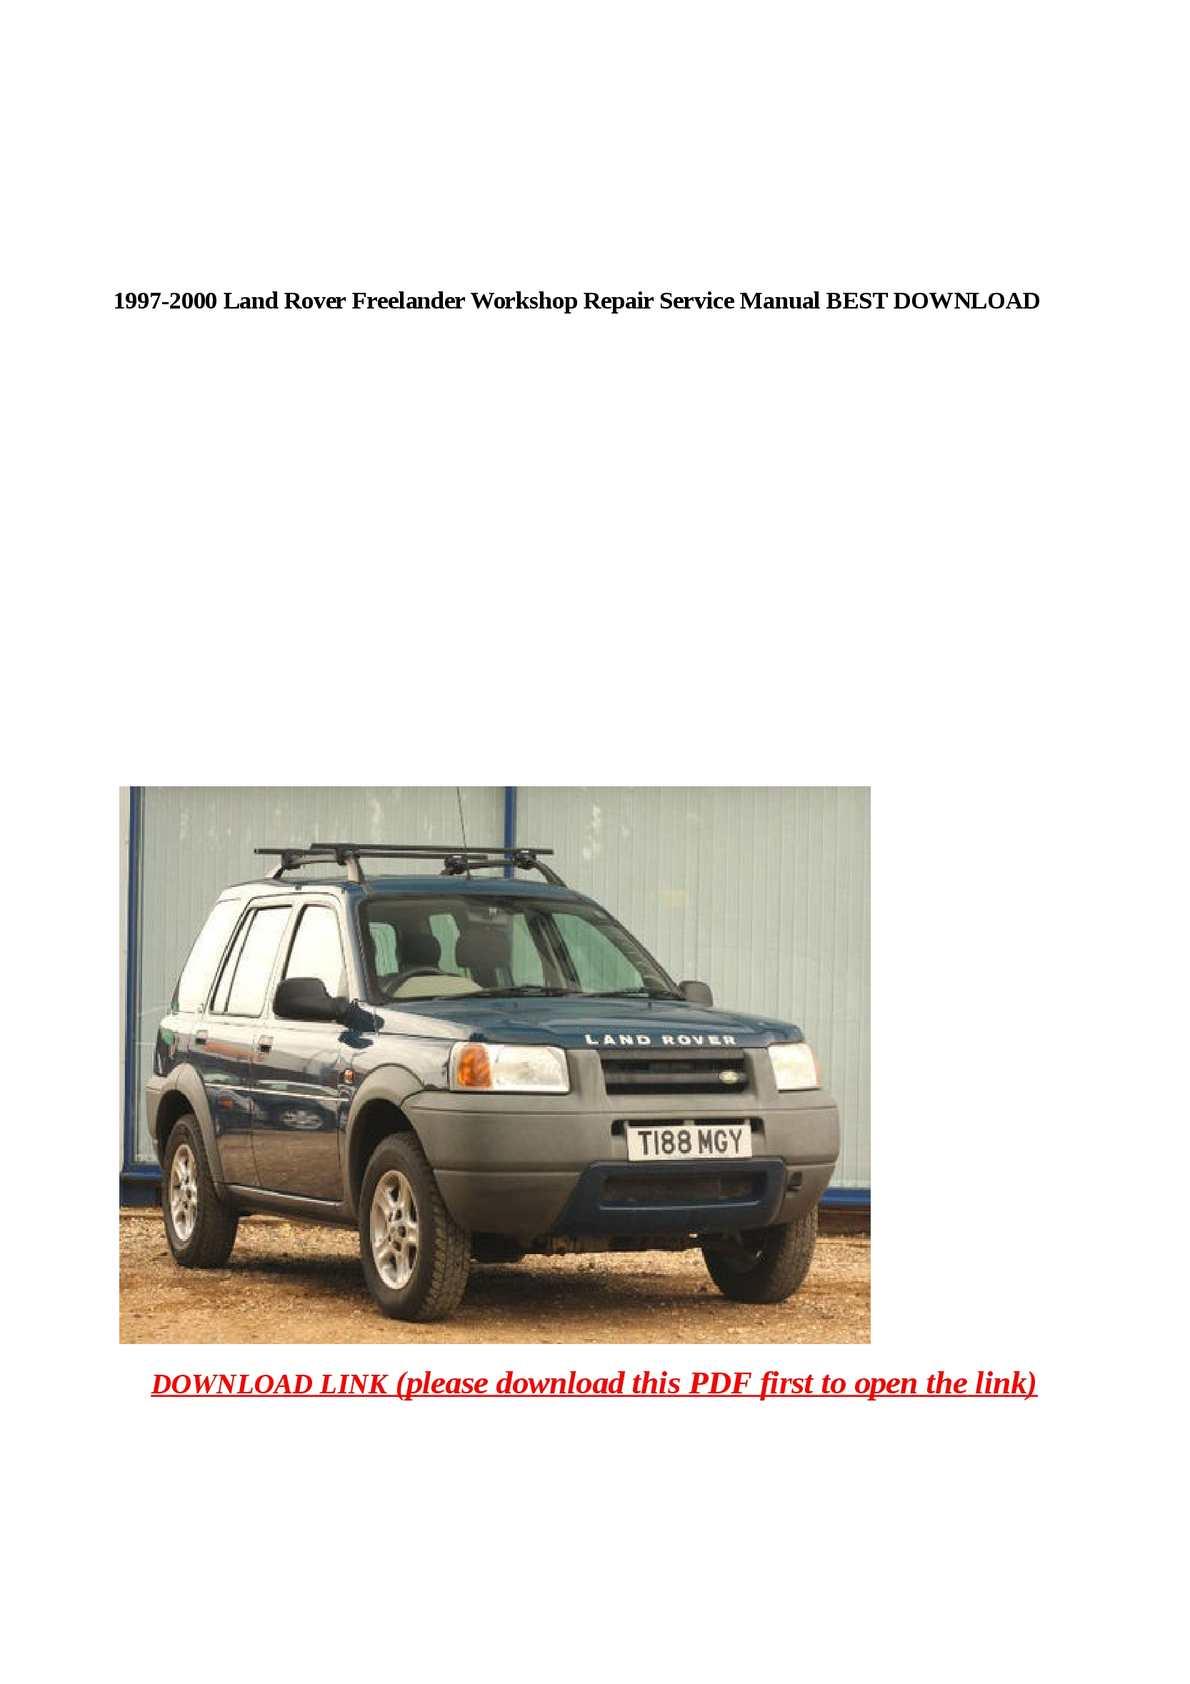 Calaméo 1997 2000 Land Rover Freelander Workshop Repair Service